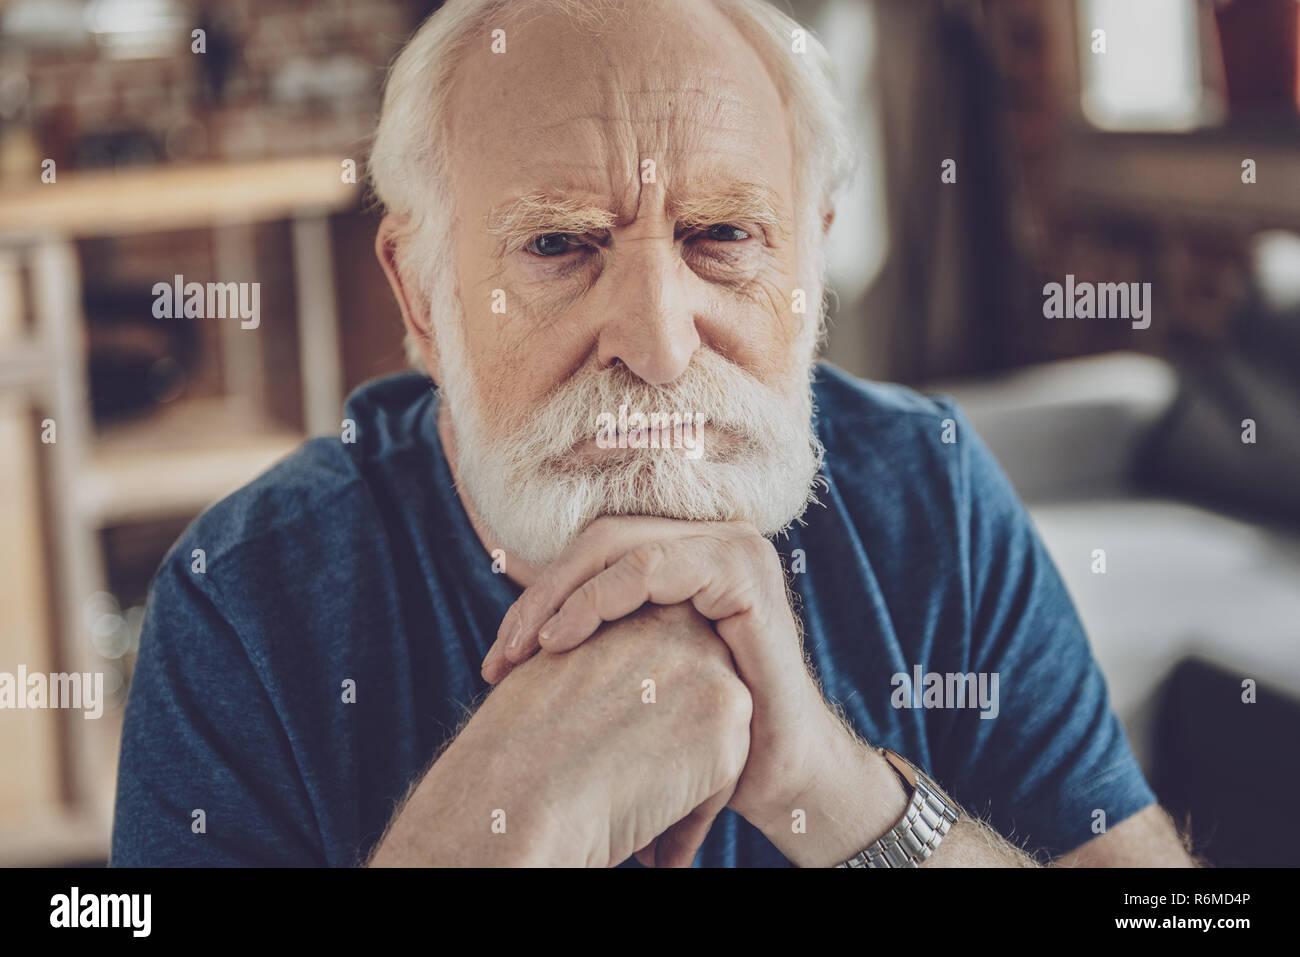 Emotional bearded man posing on camera - Stock Image